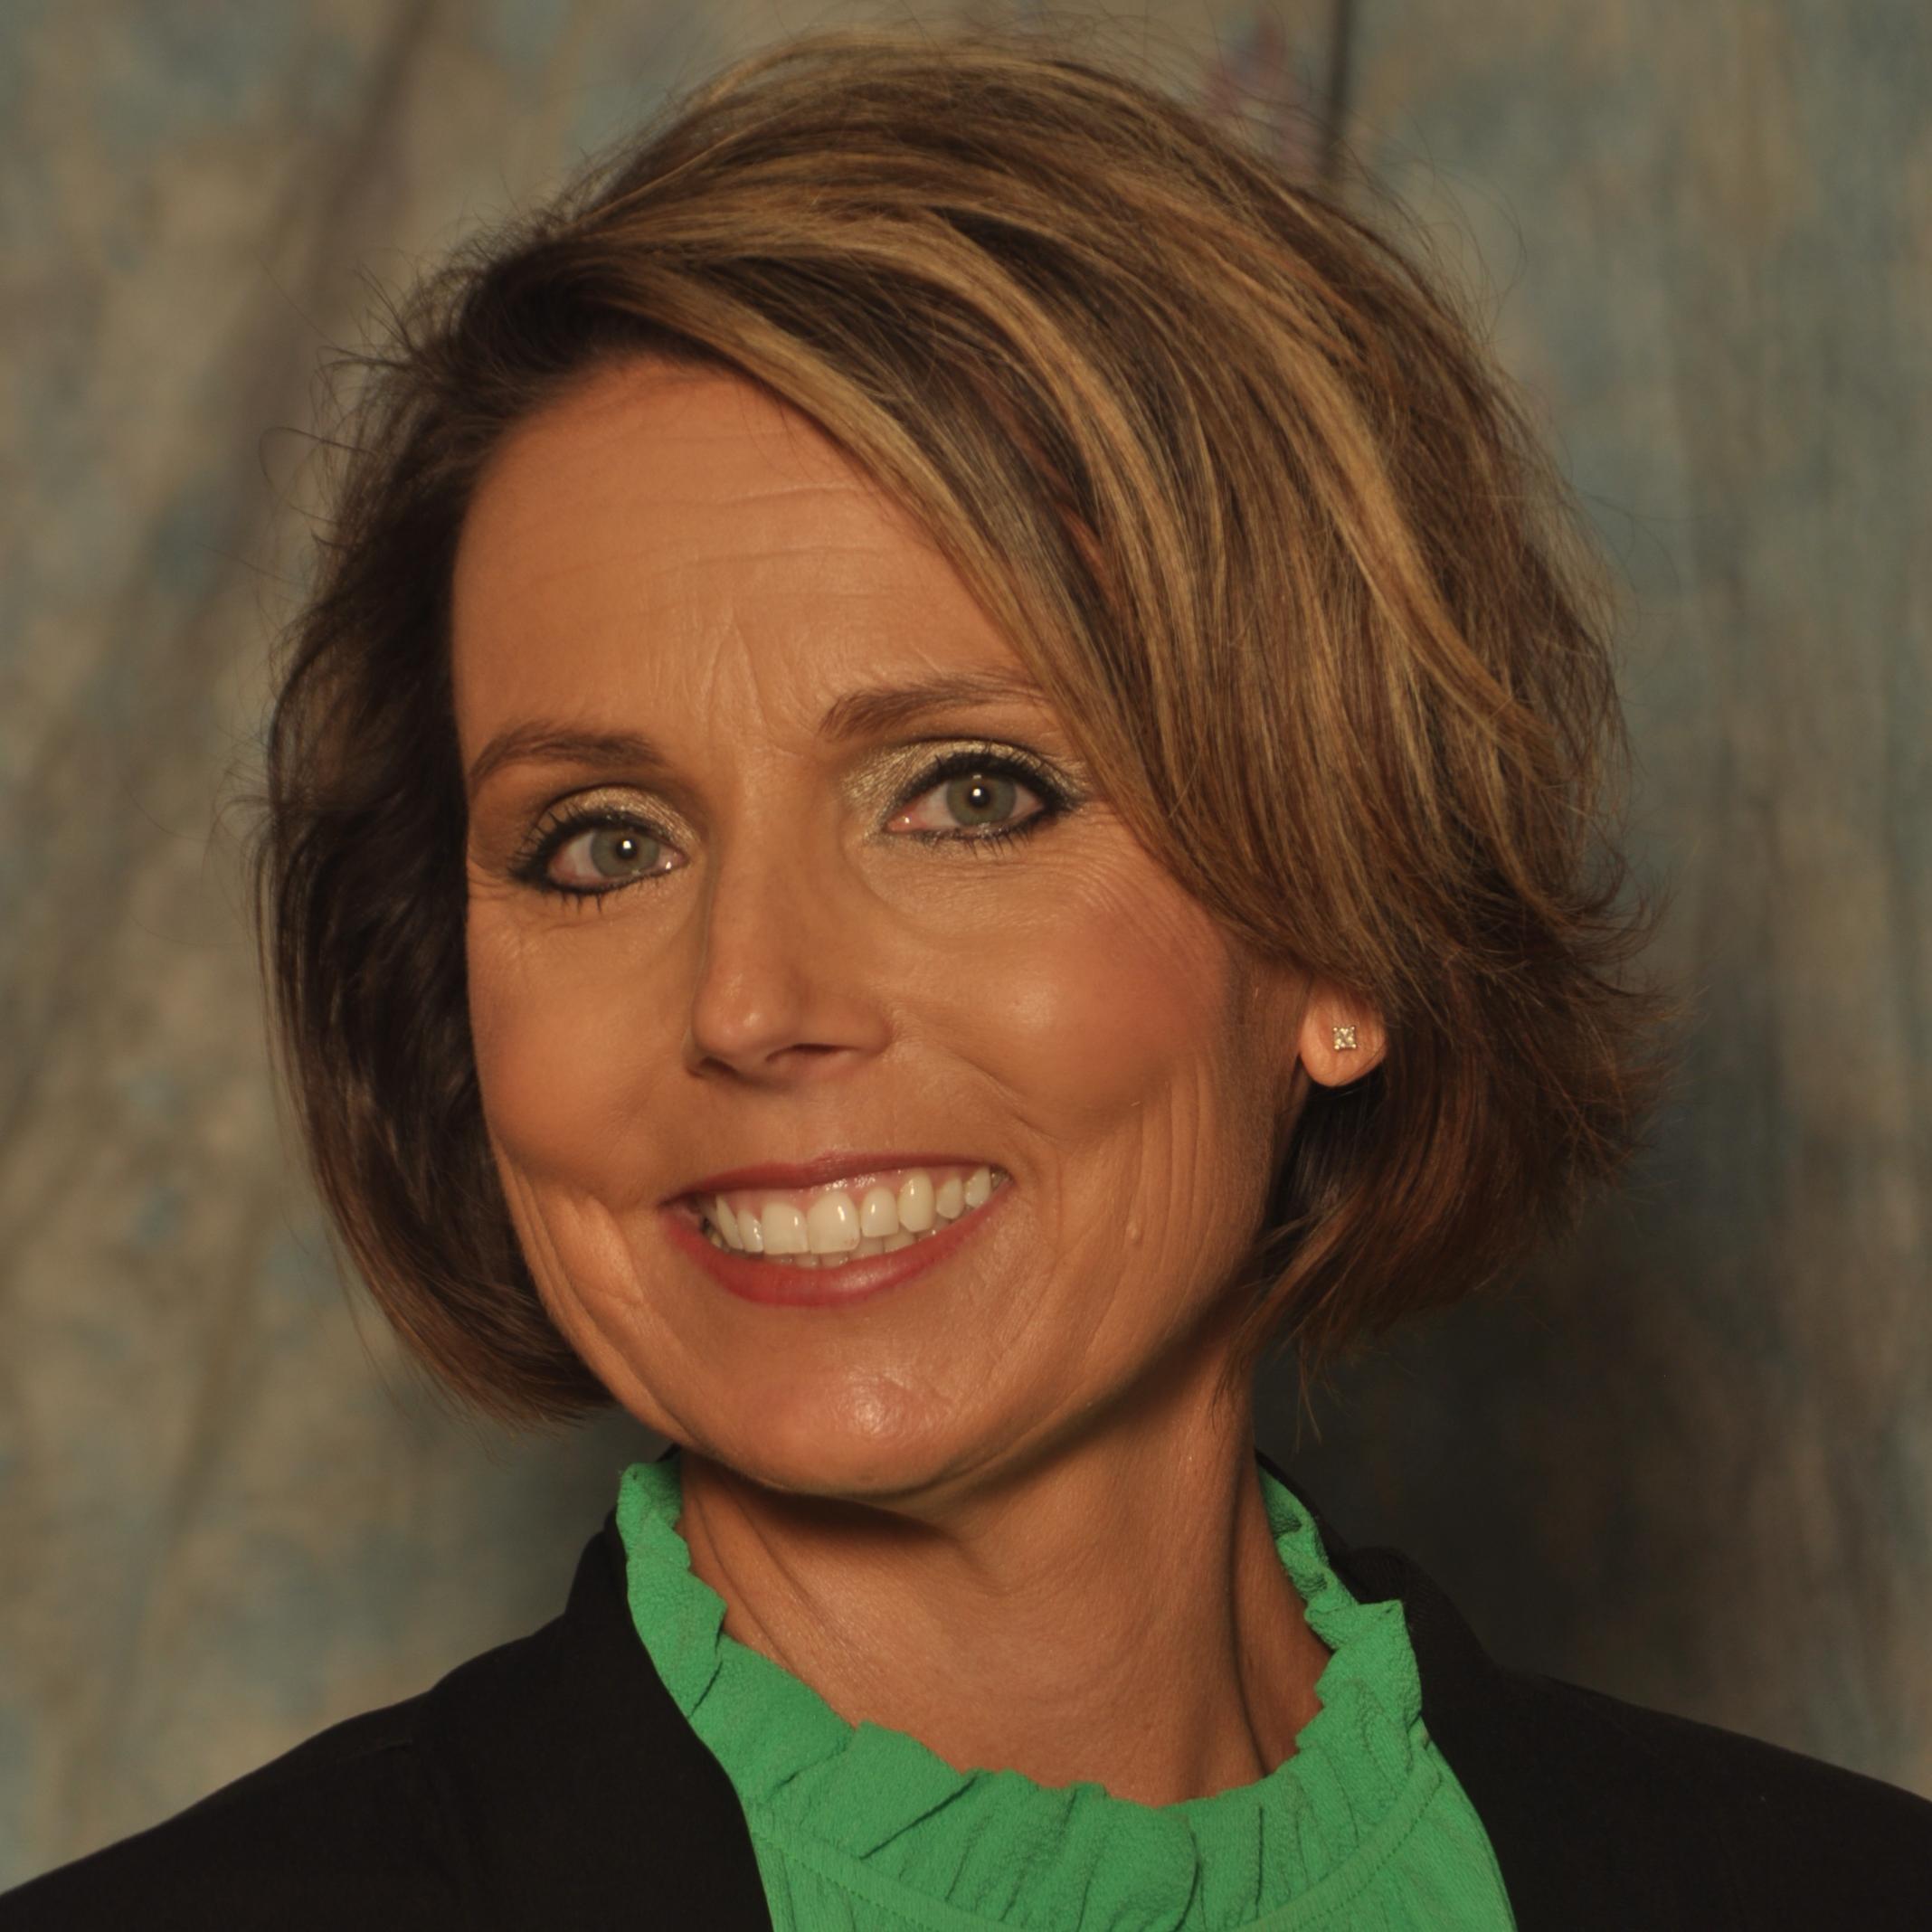 Mrs. Tiffany Morgan, Armorel School Superintendent